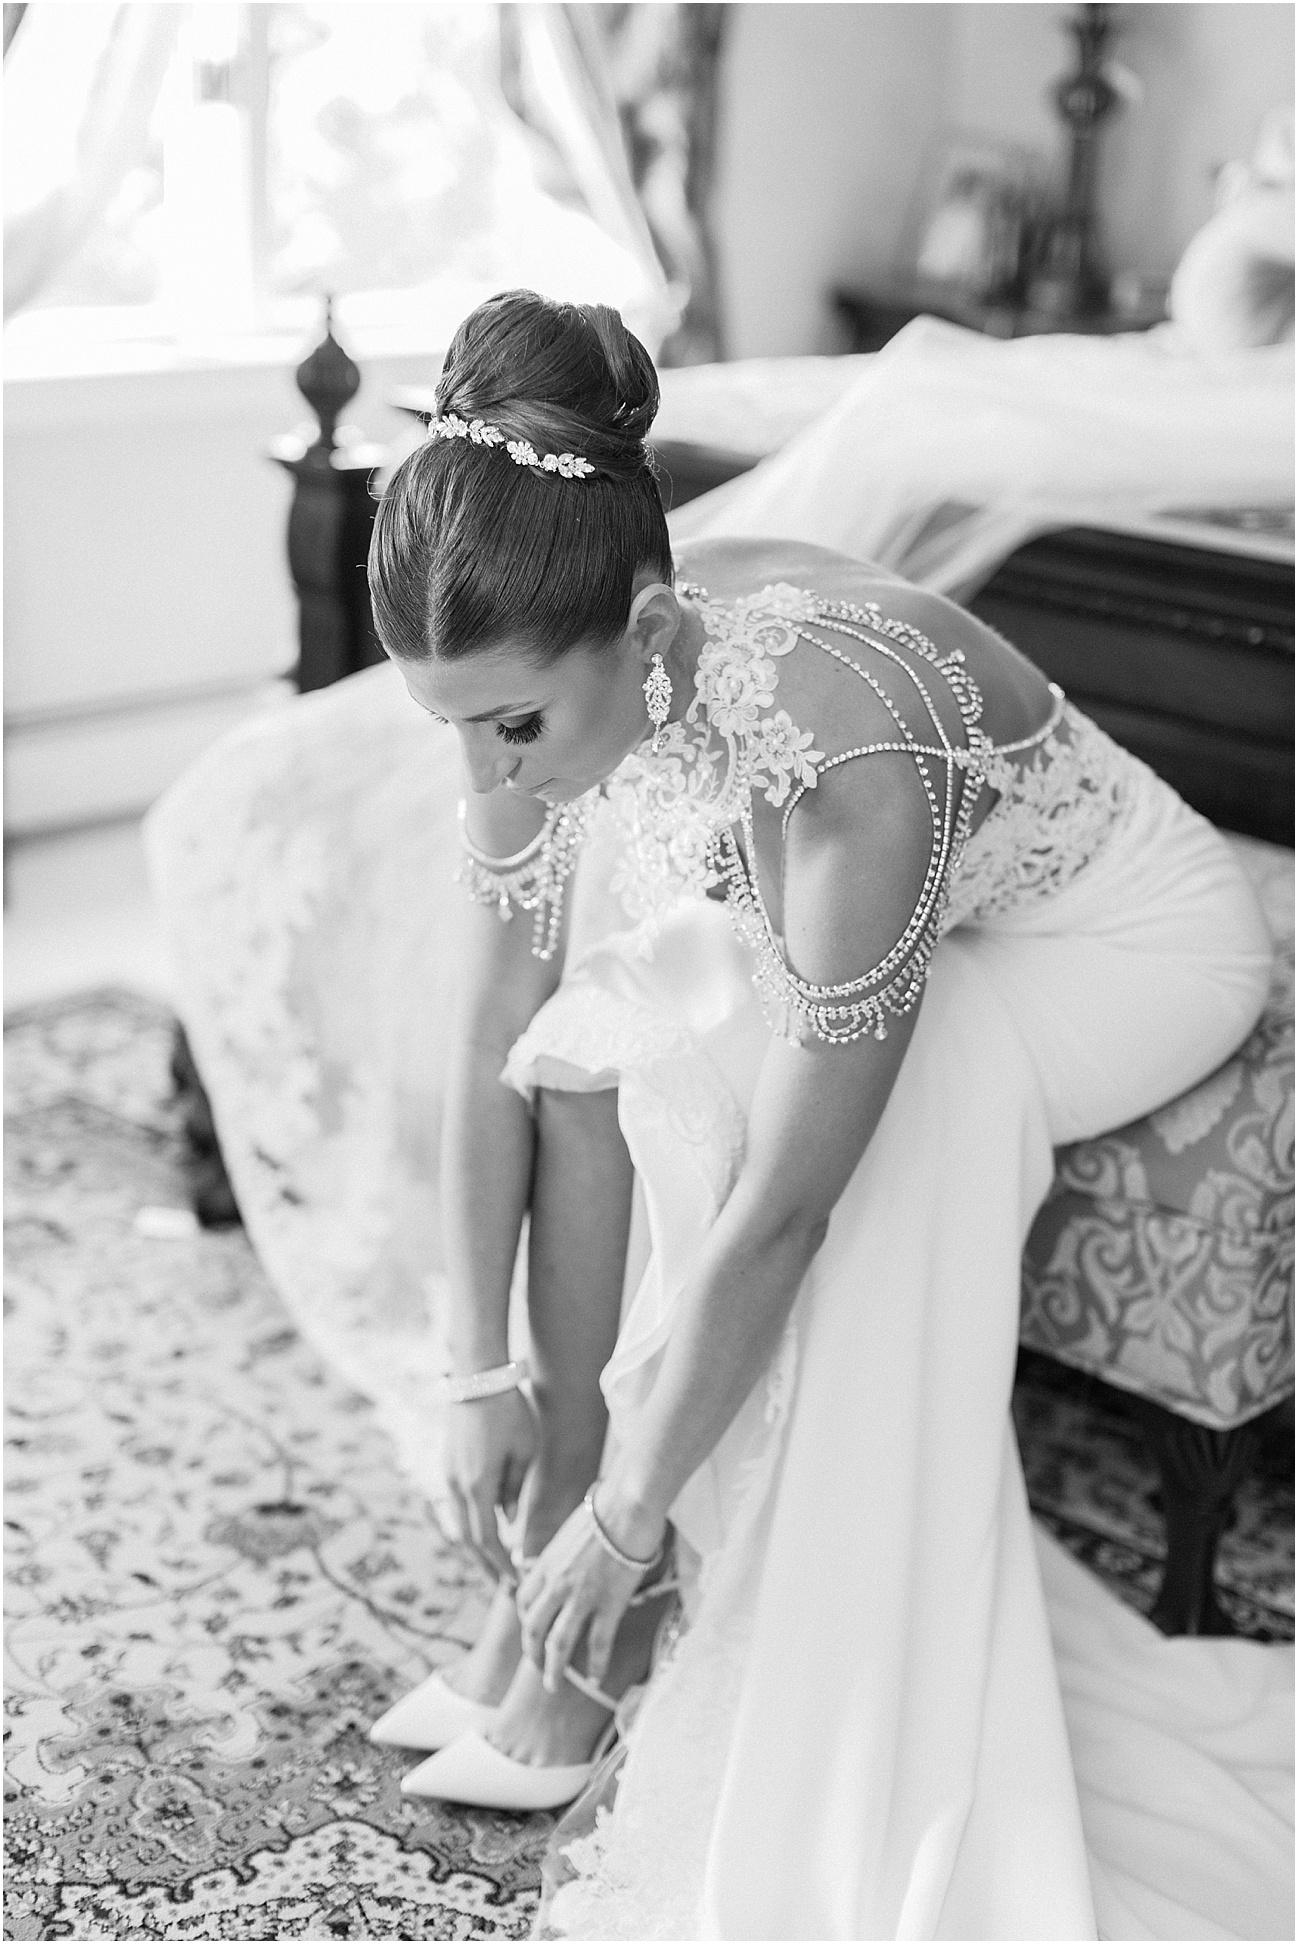 bianca_chris_danversport_italian_blush_gold_north_shore_cape_cod_boston_wedding_photographer_meredith_jane_photography_photo_1111.jpg